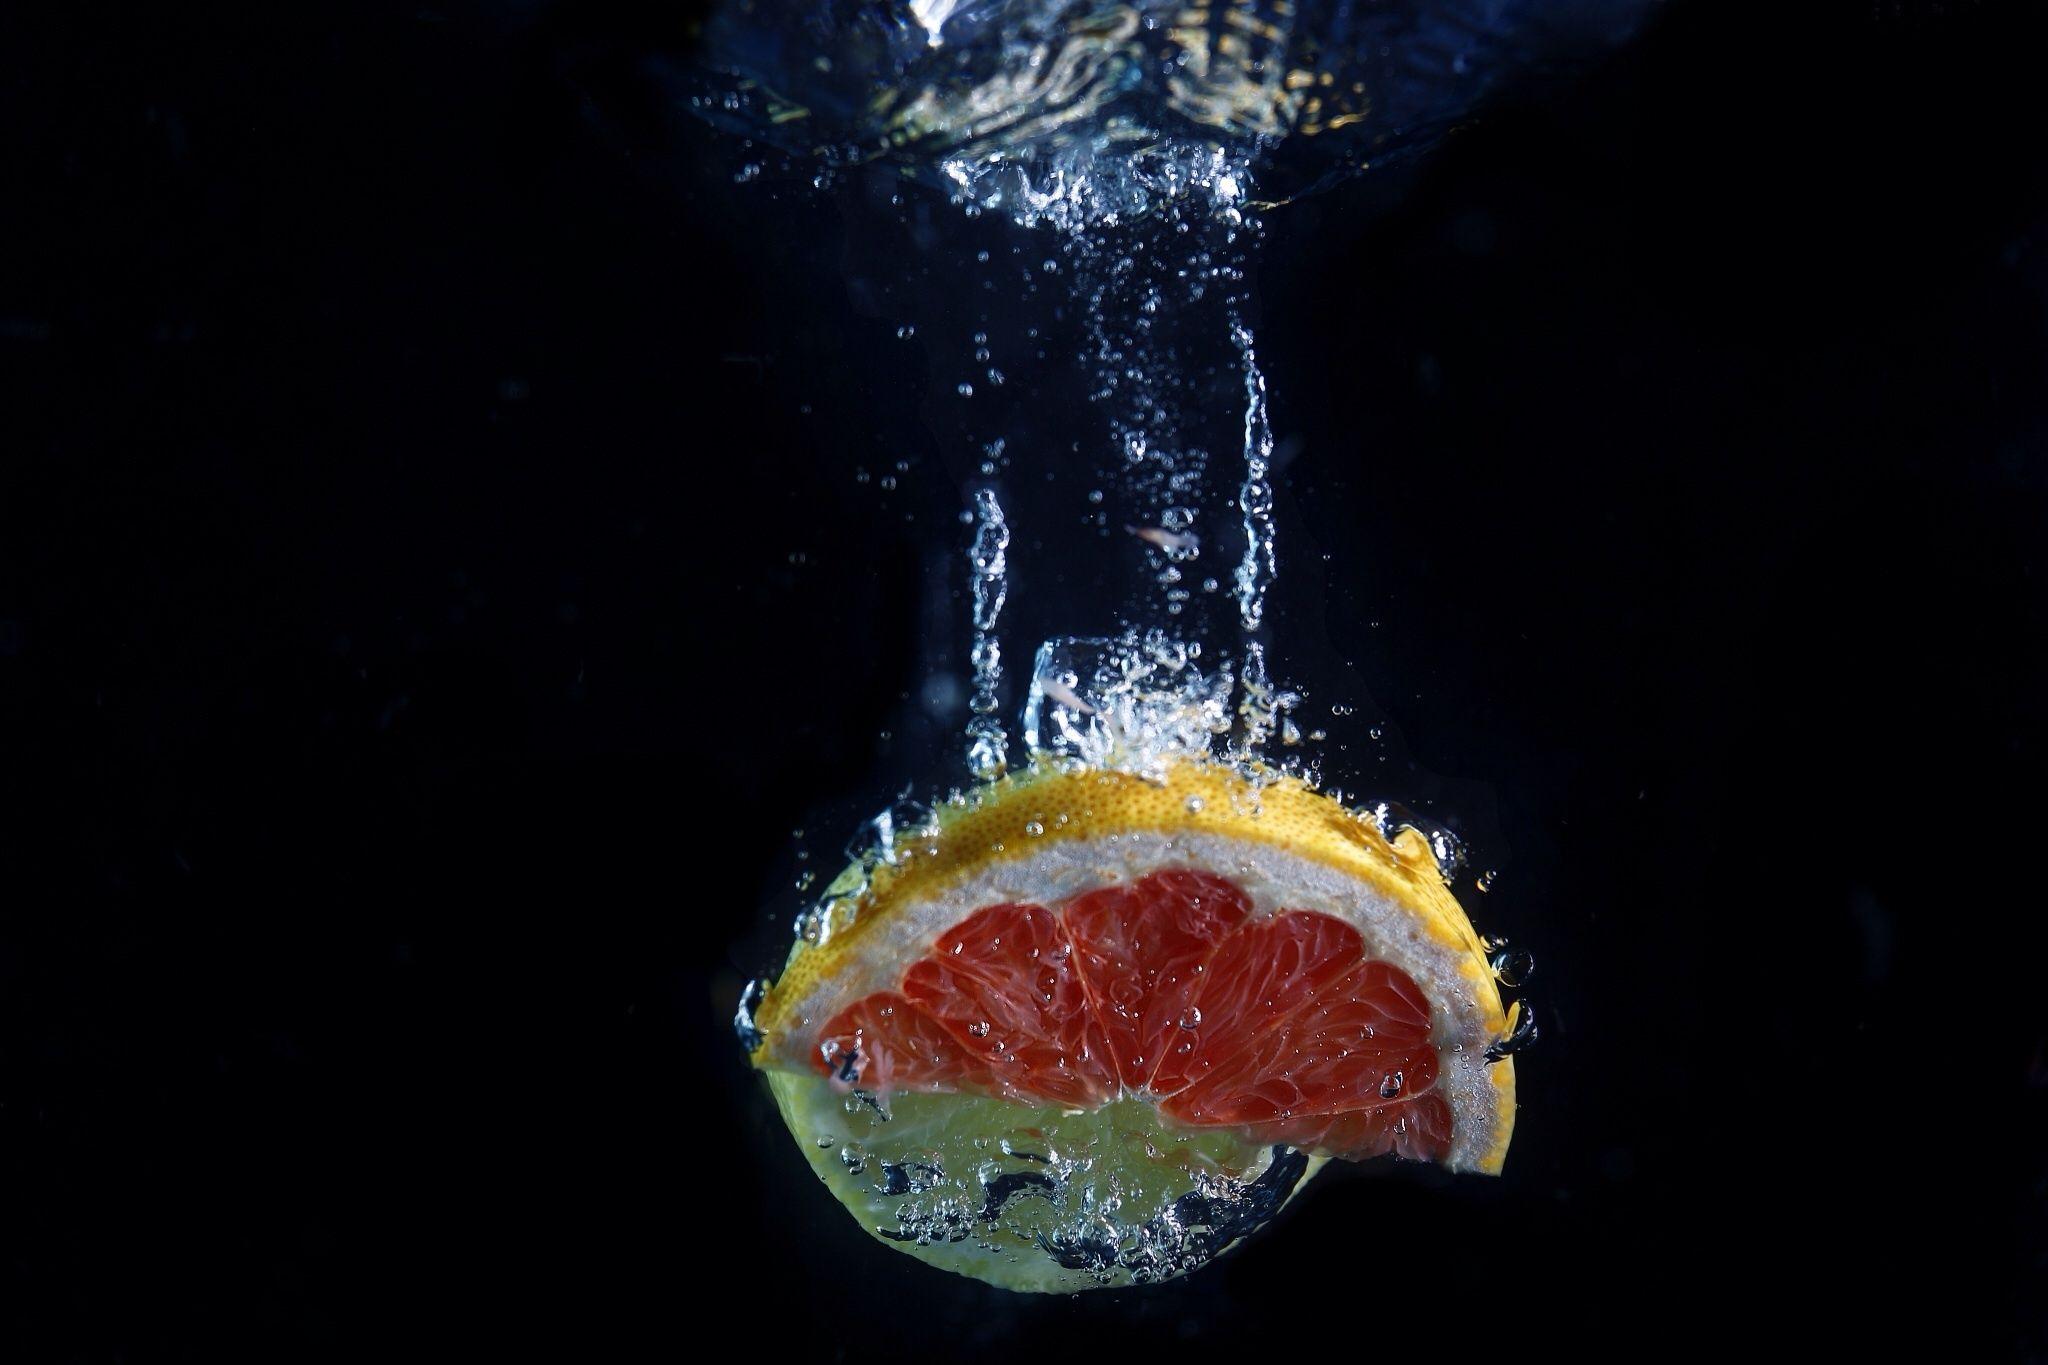 Grapefruit dumped by Massimo De Rivo on 500px